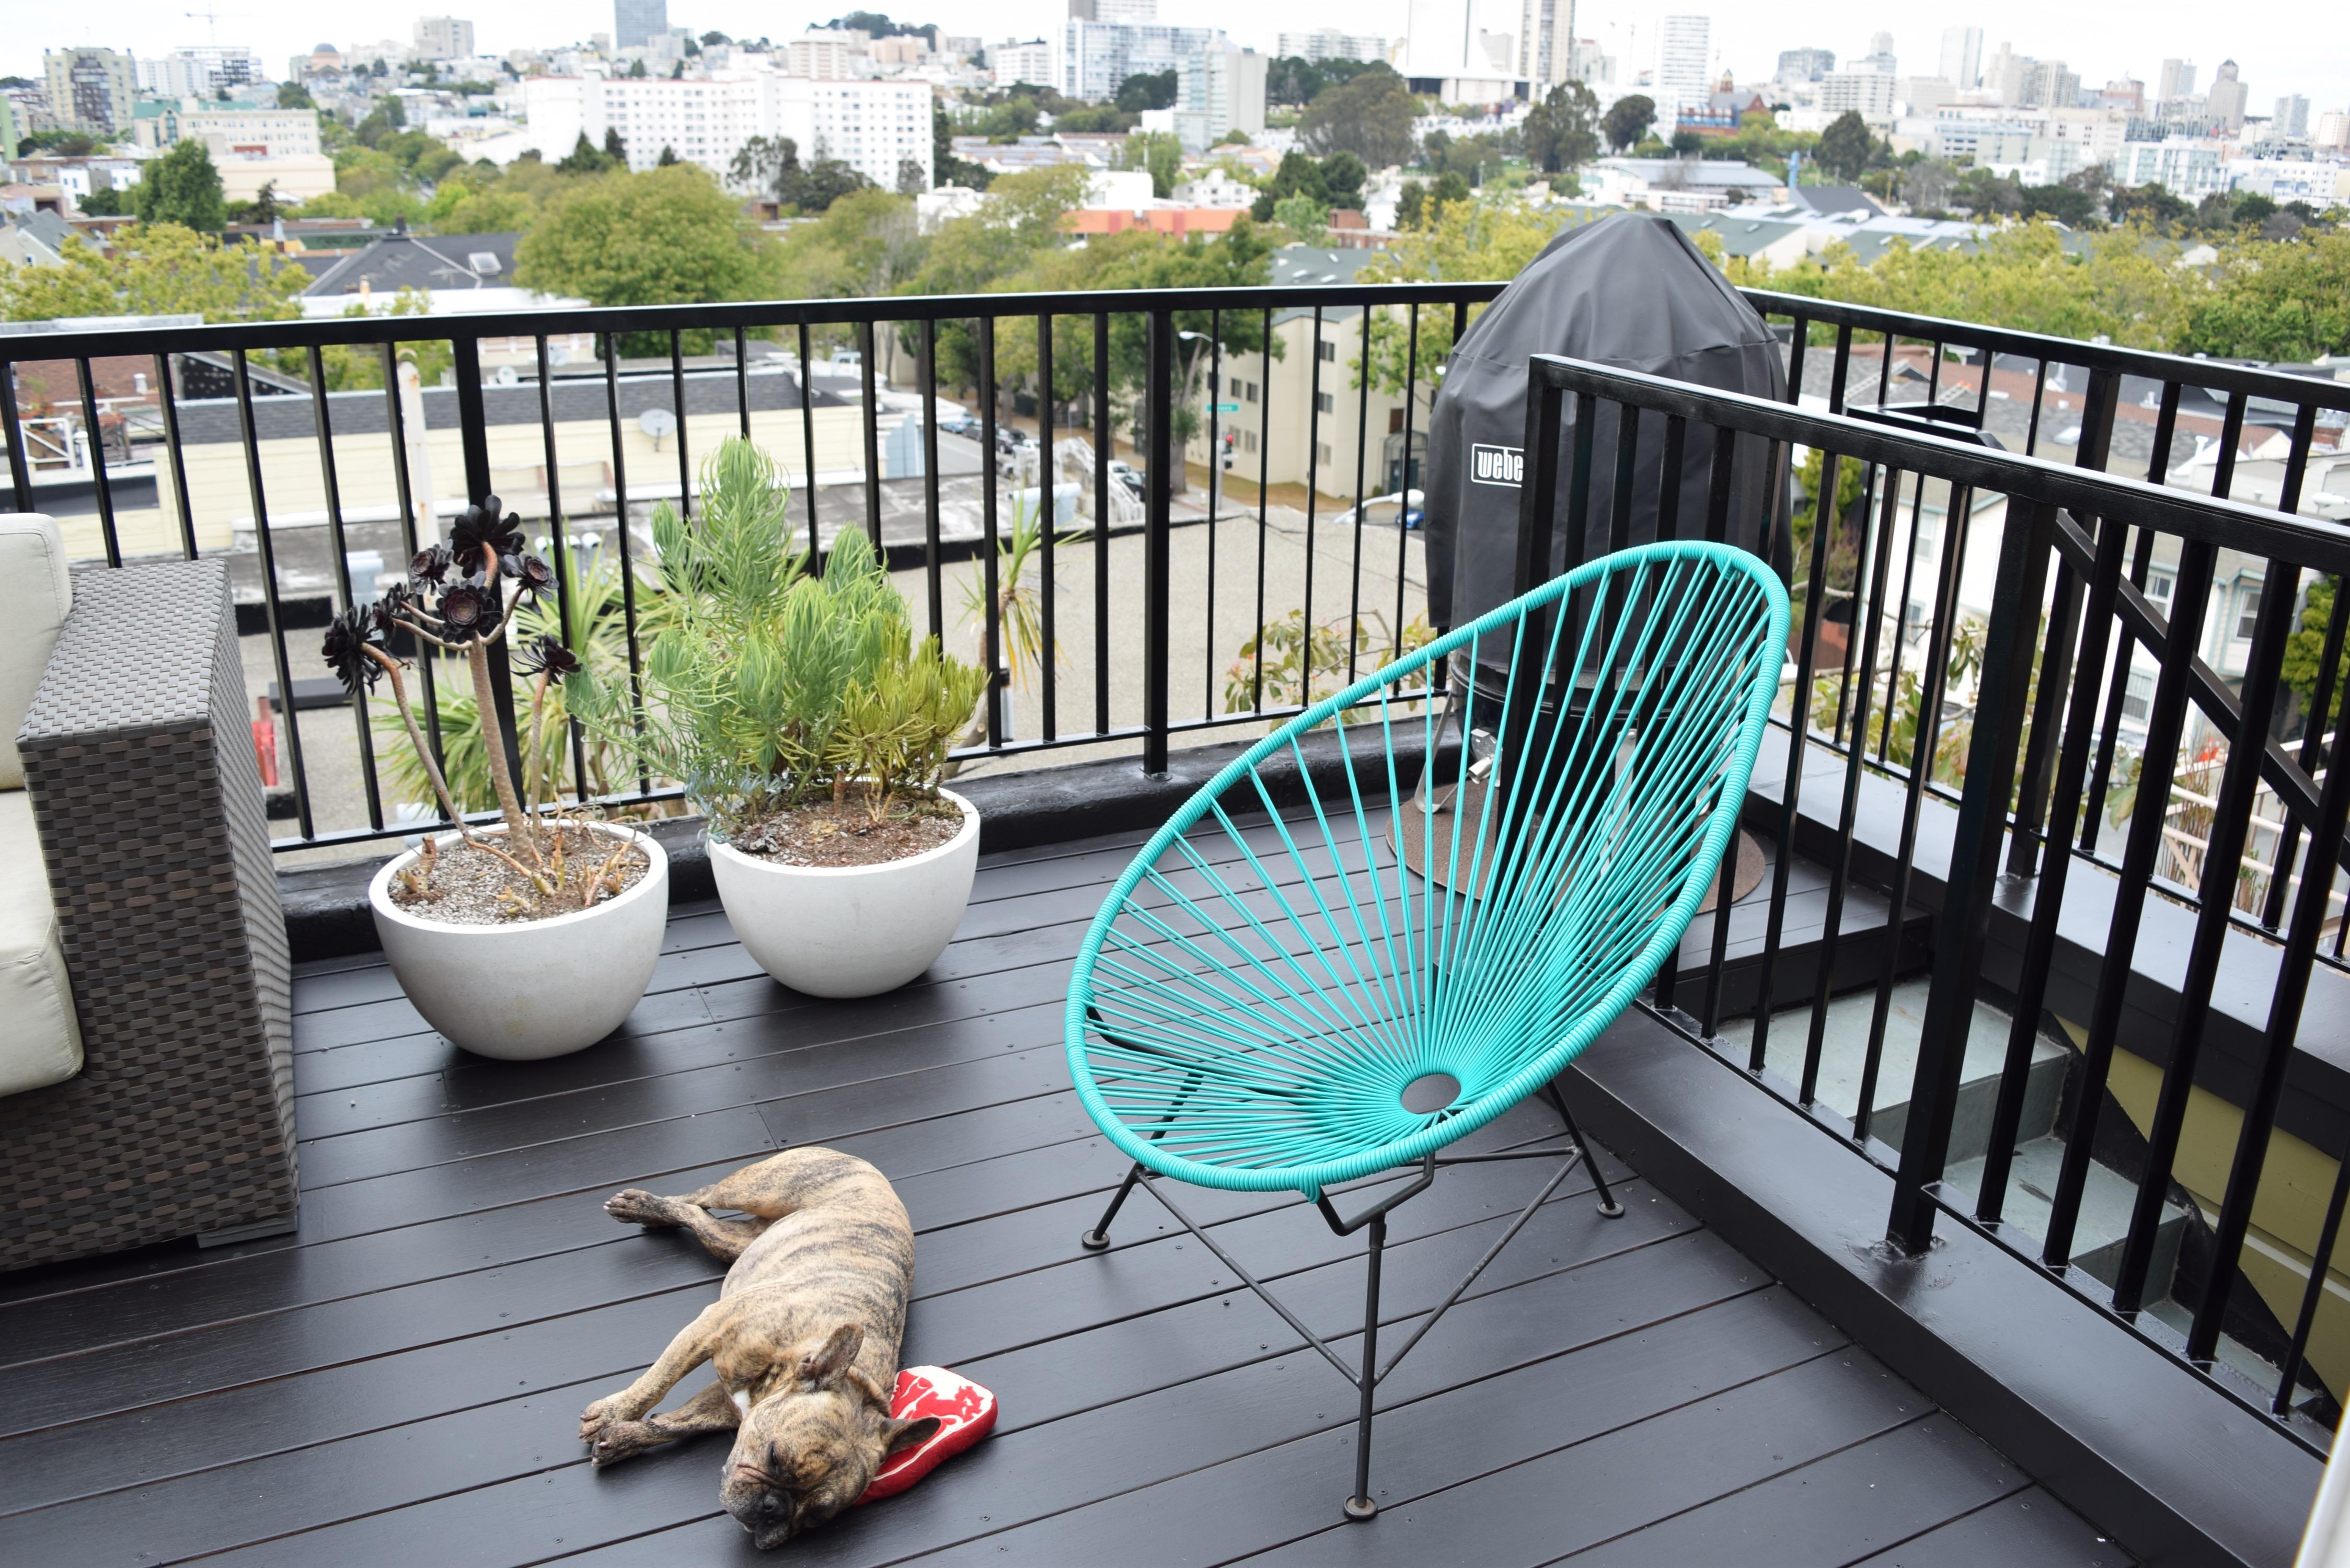 Diy Painted My Outdoor Deck Railings Black Noznoznoz in size 4496 X 3000